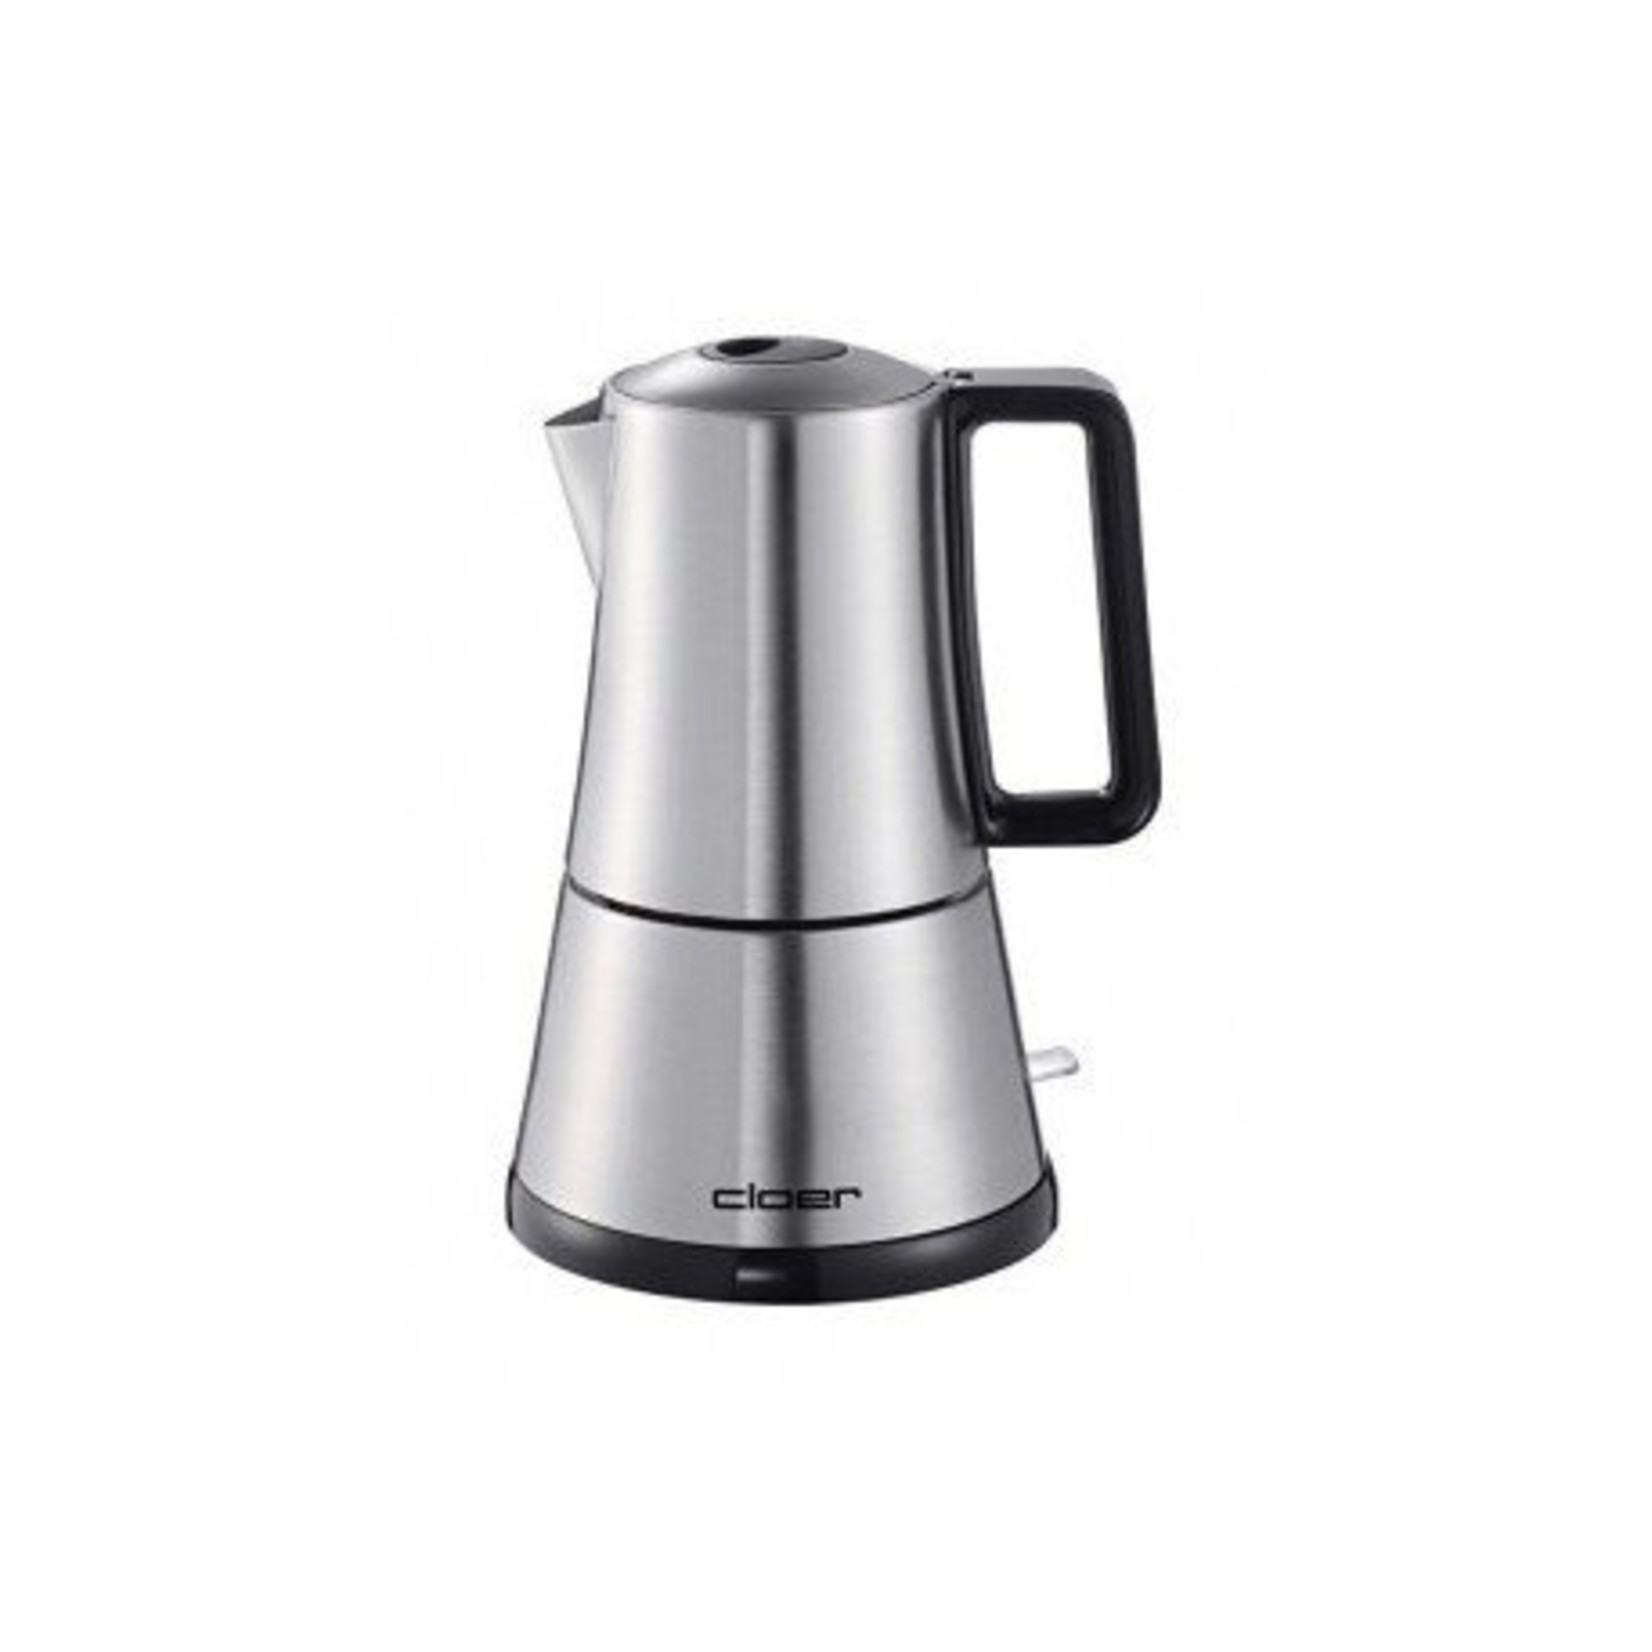 Cloer Cloer Mokkamaker / Espressopotje / Percolator